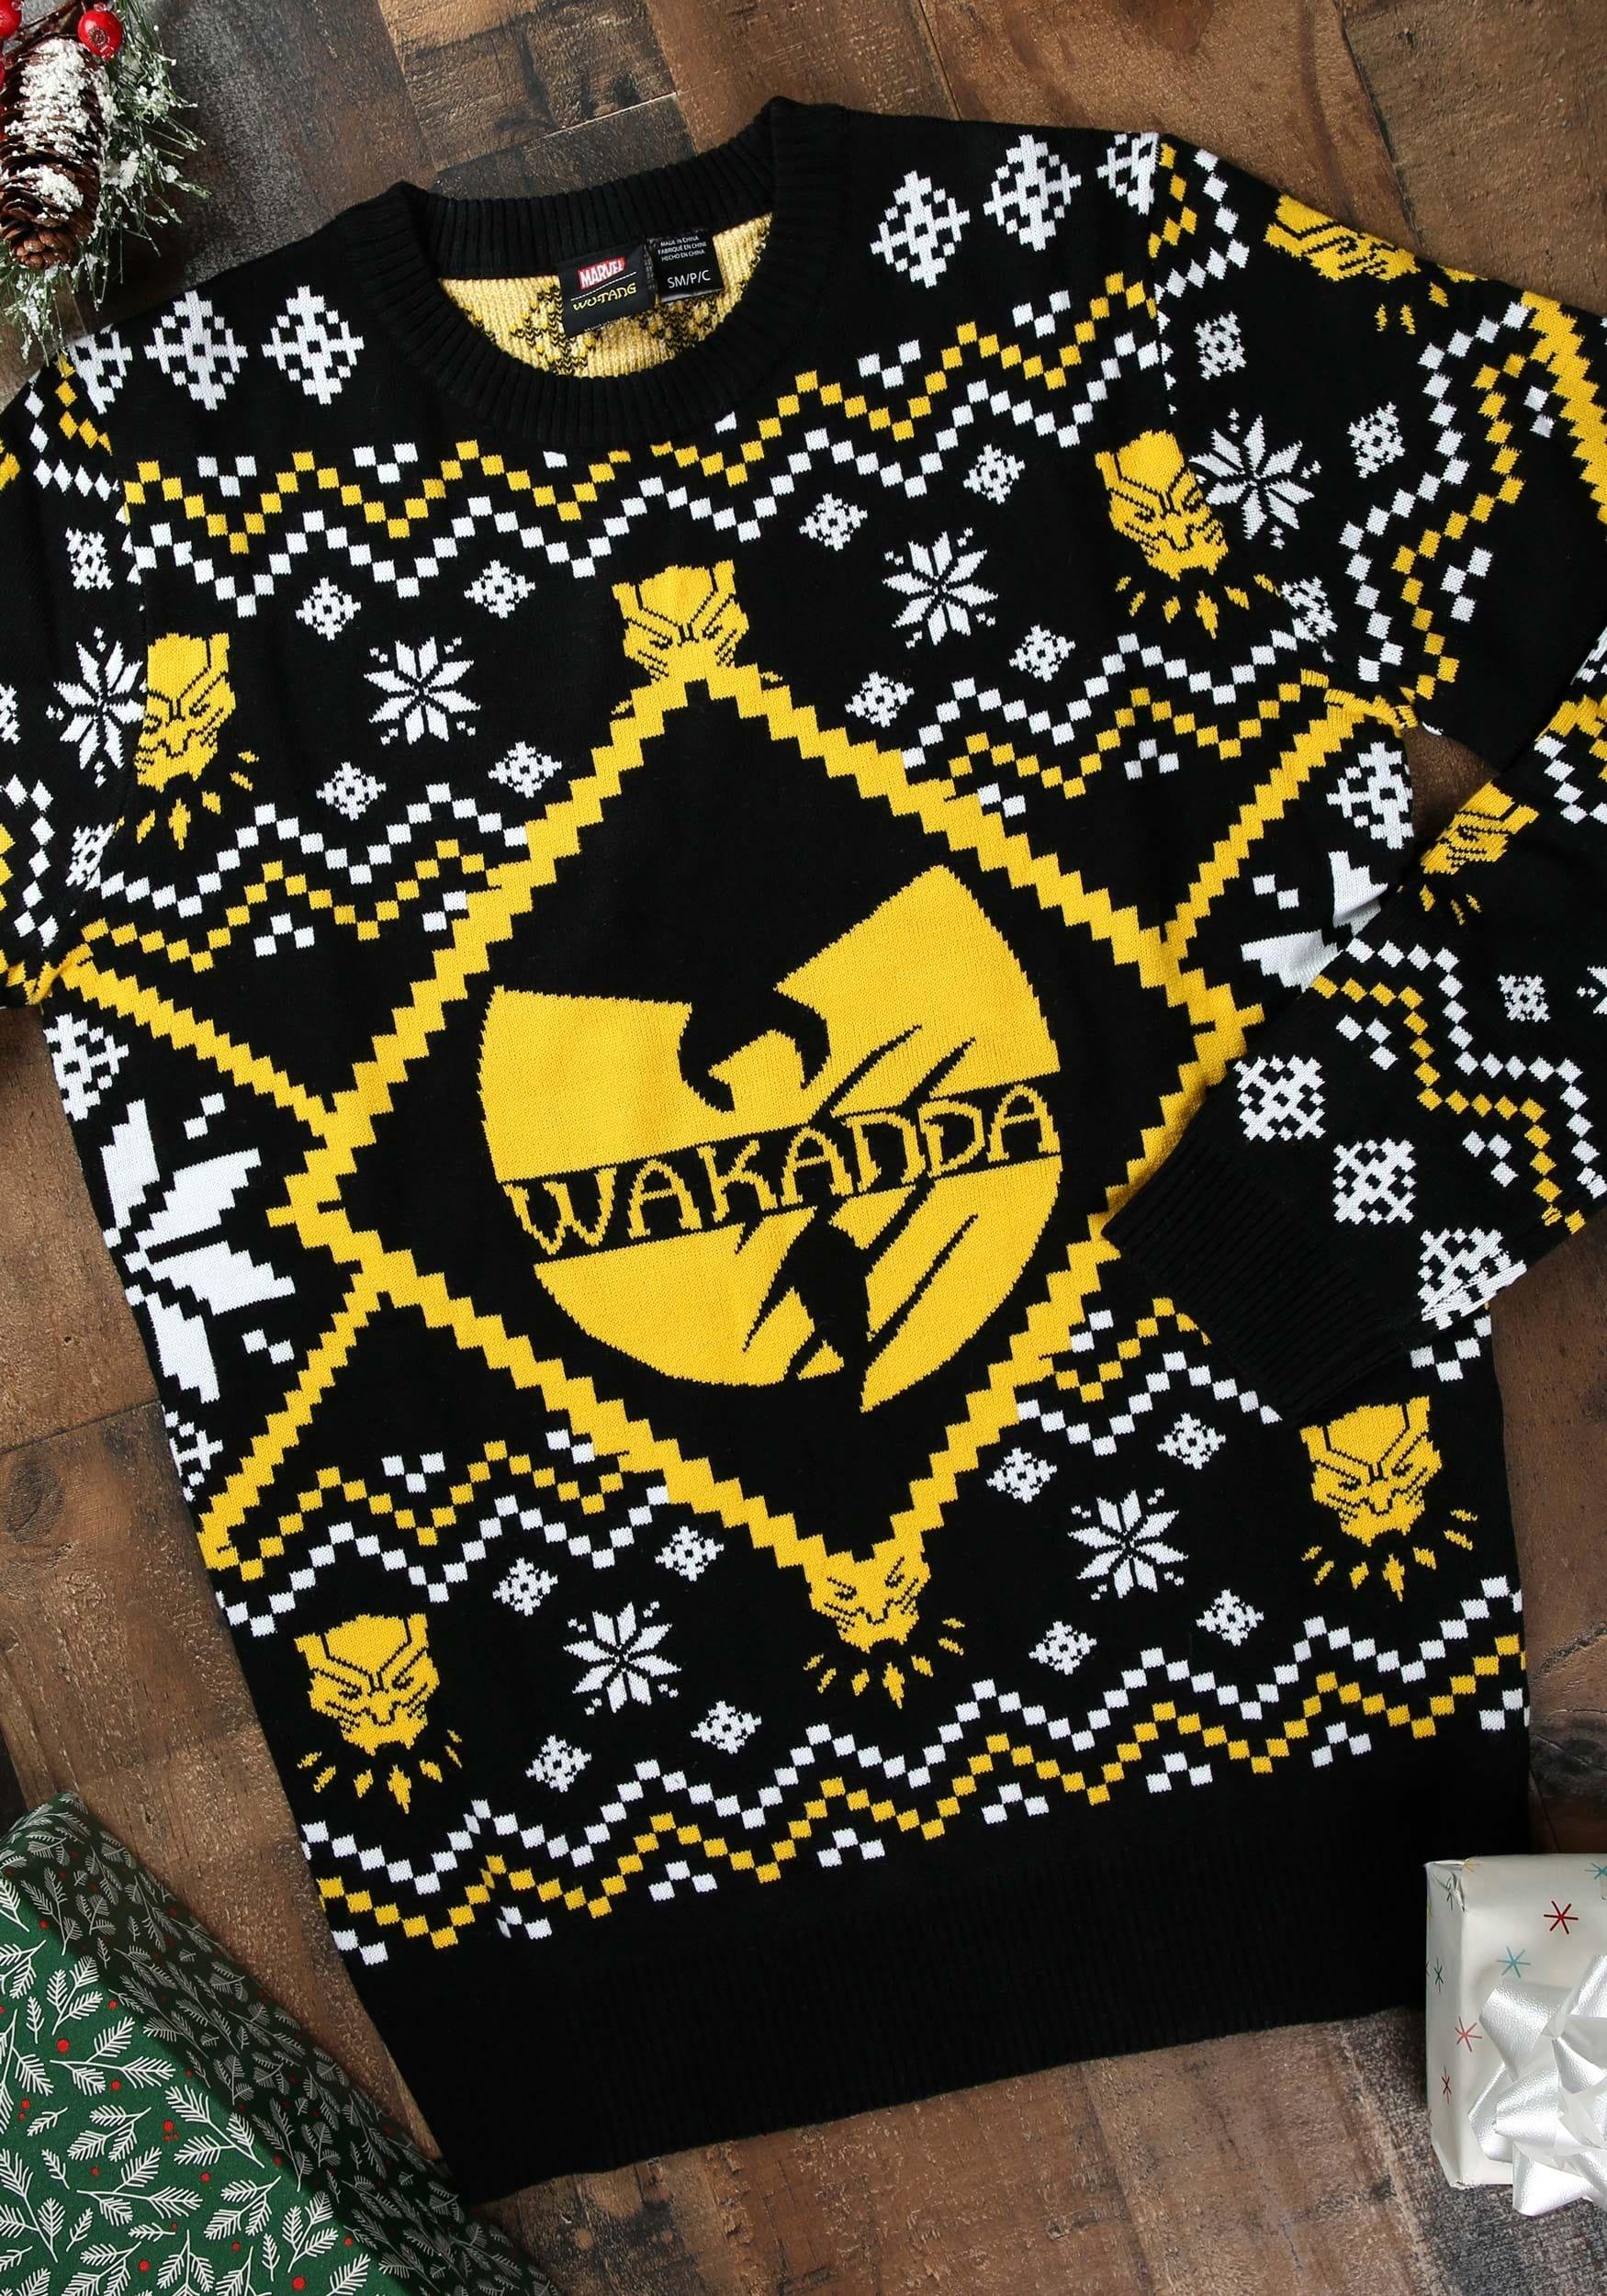 eb6e9ea7da4 Black Panther Wakanda Intarsia Adult Knit Ugly Christmas Sweater XS ...